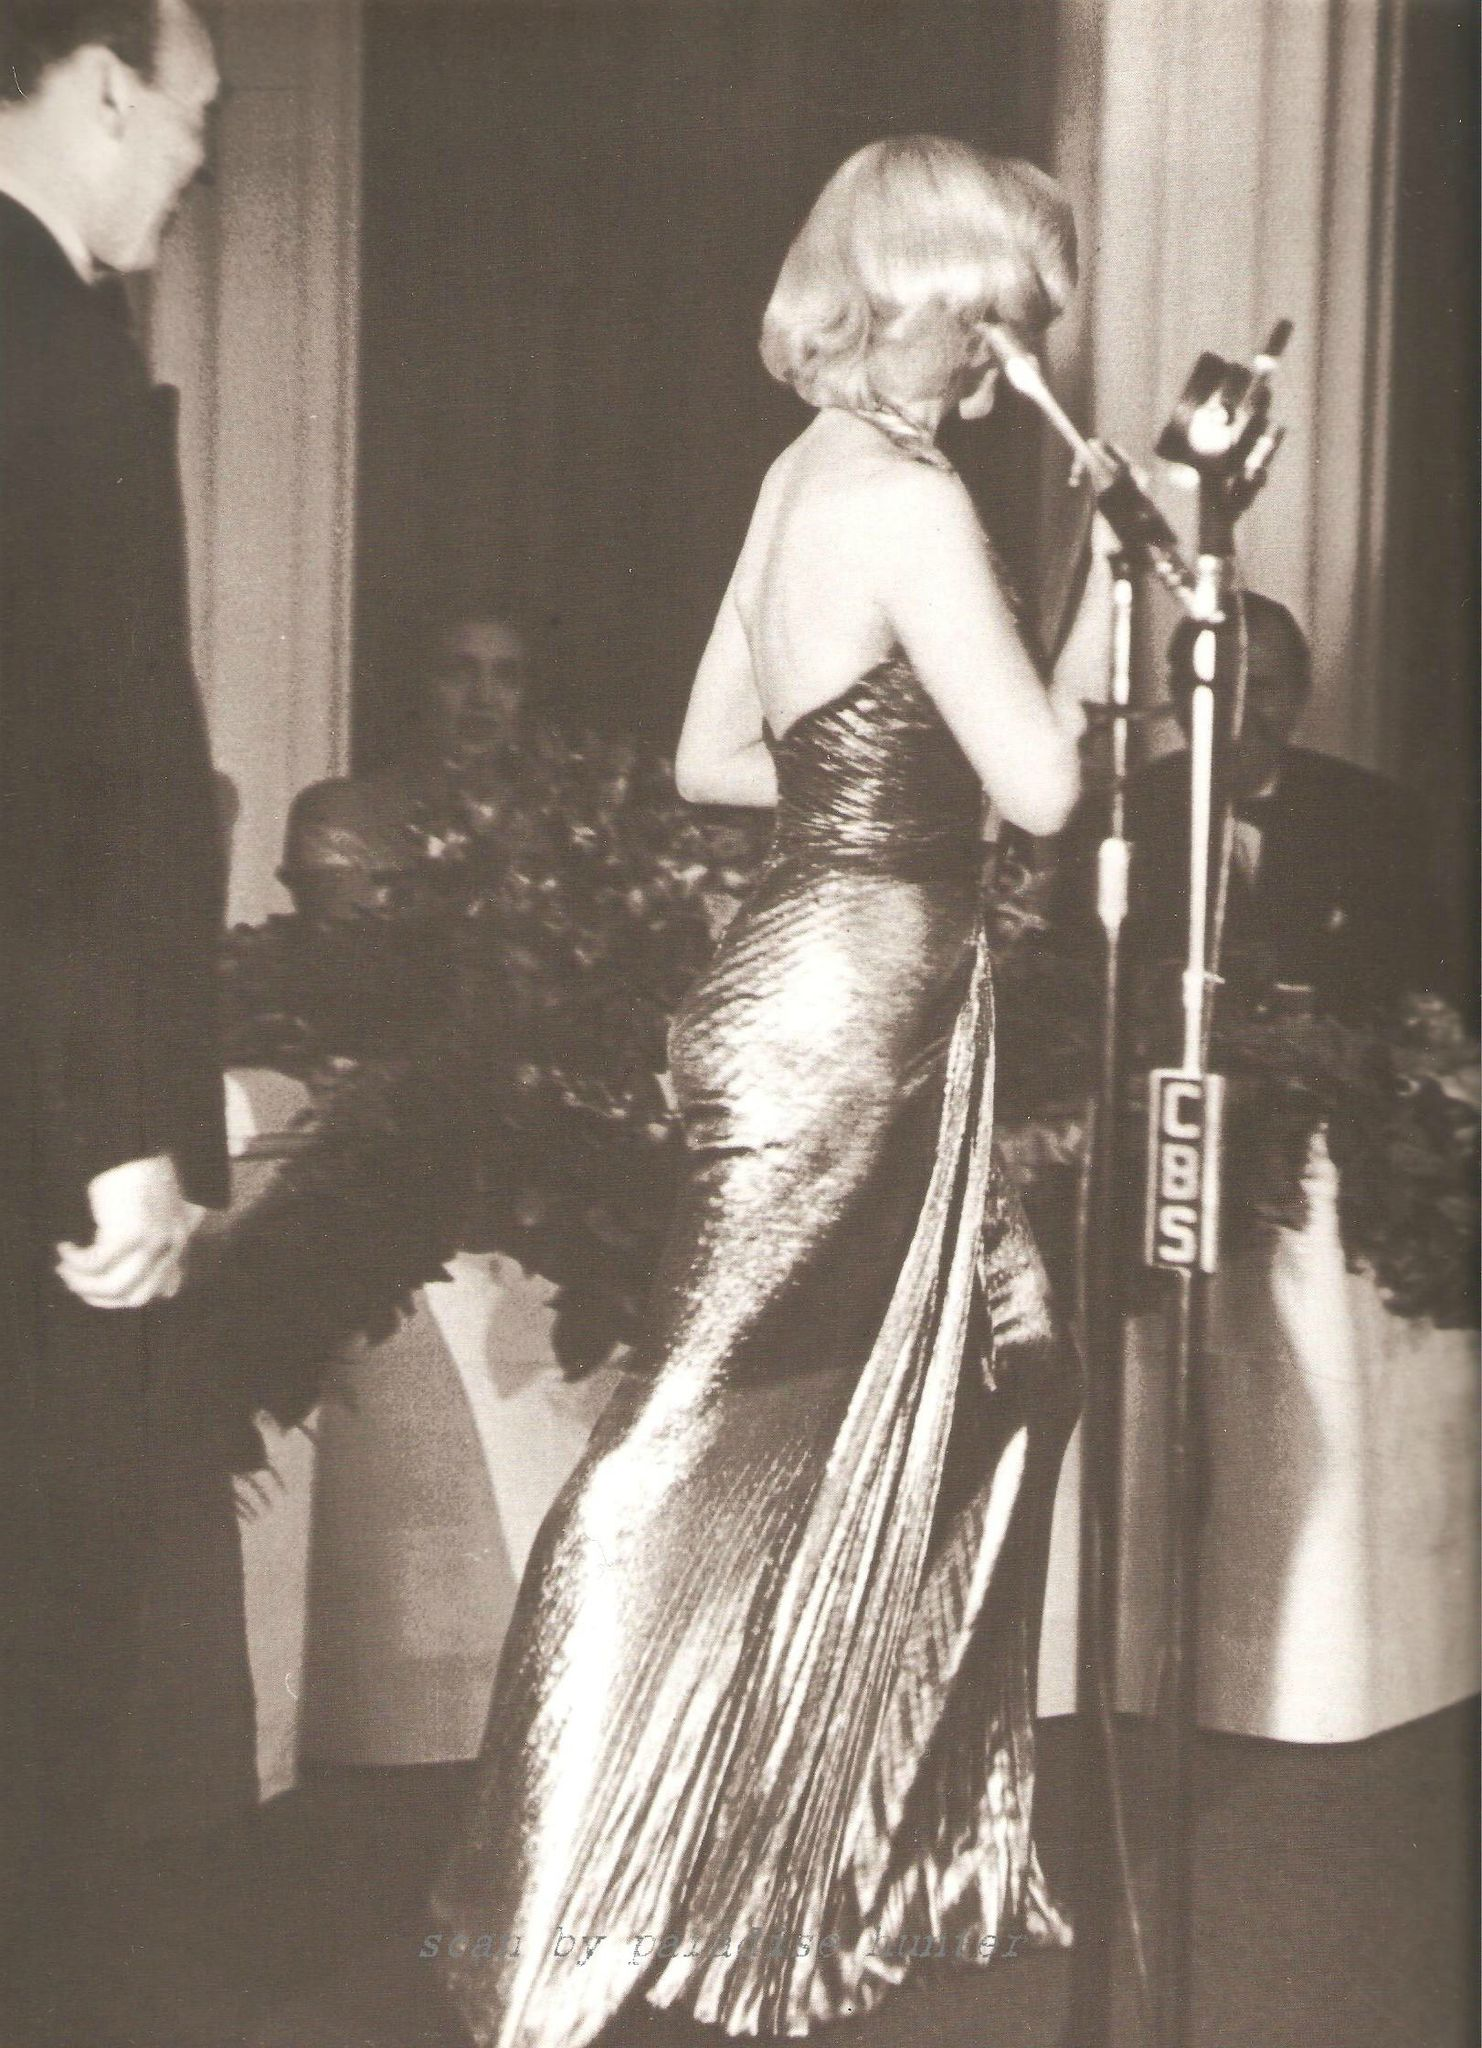 photoplay award 9 fv 1953 (17)